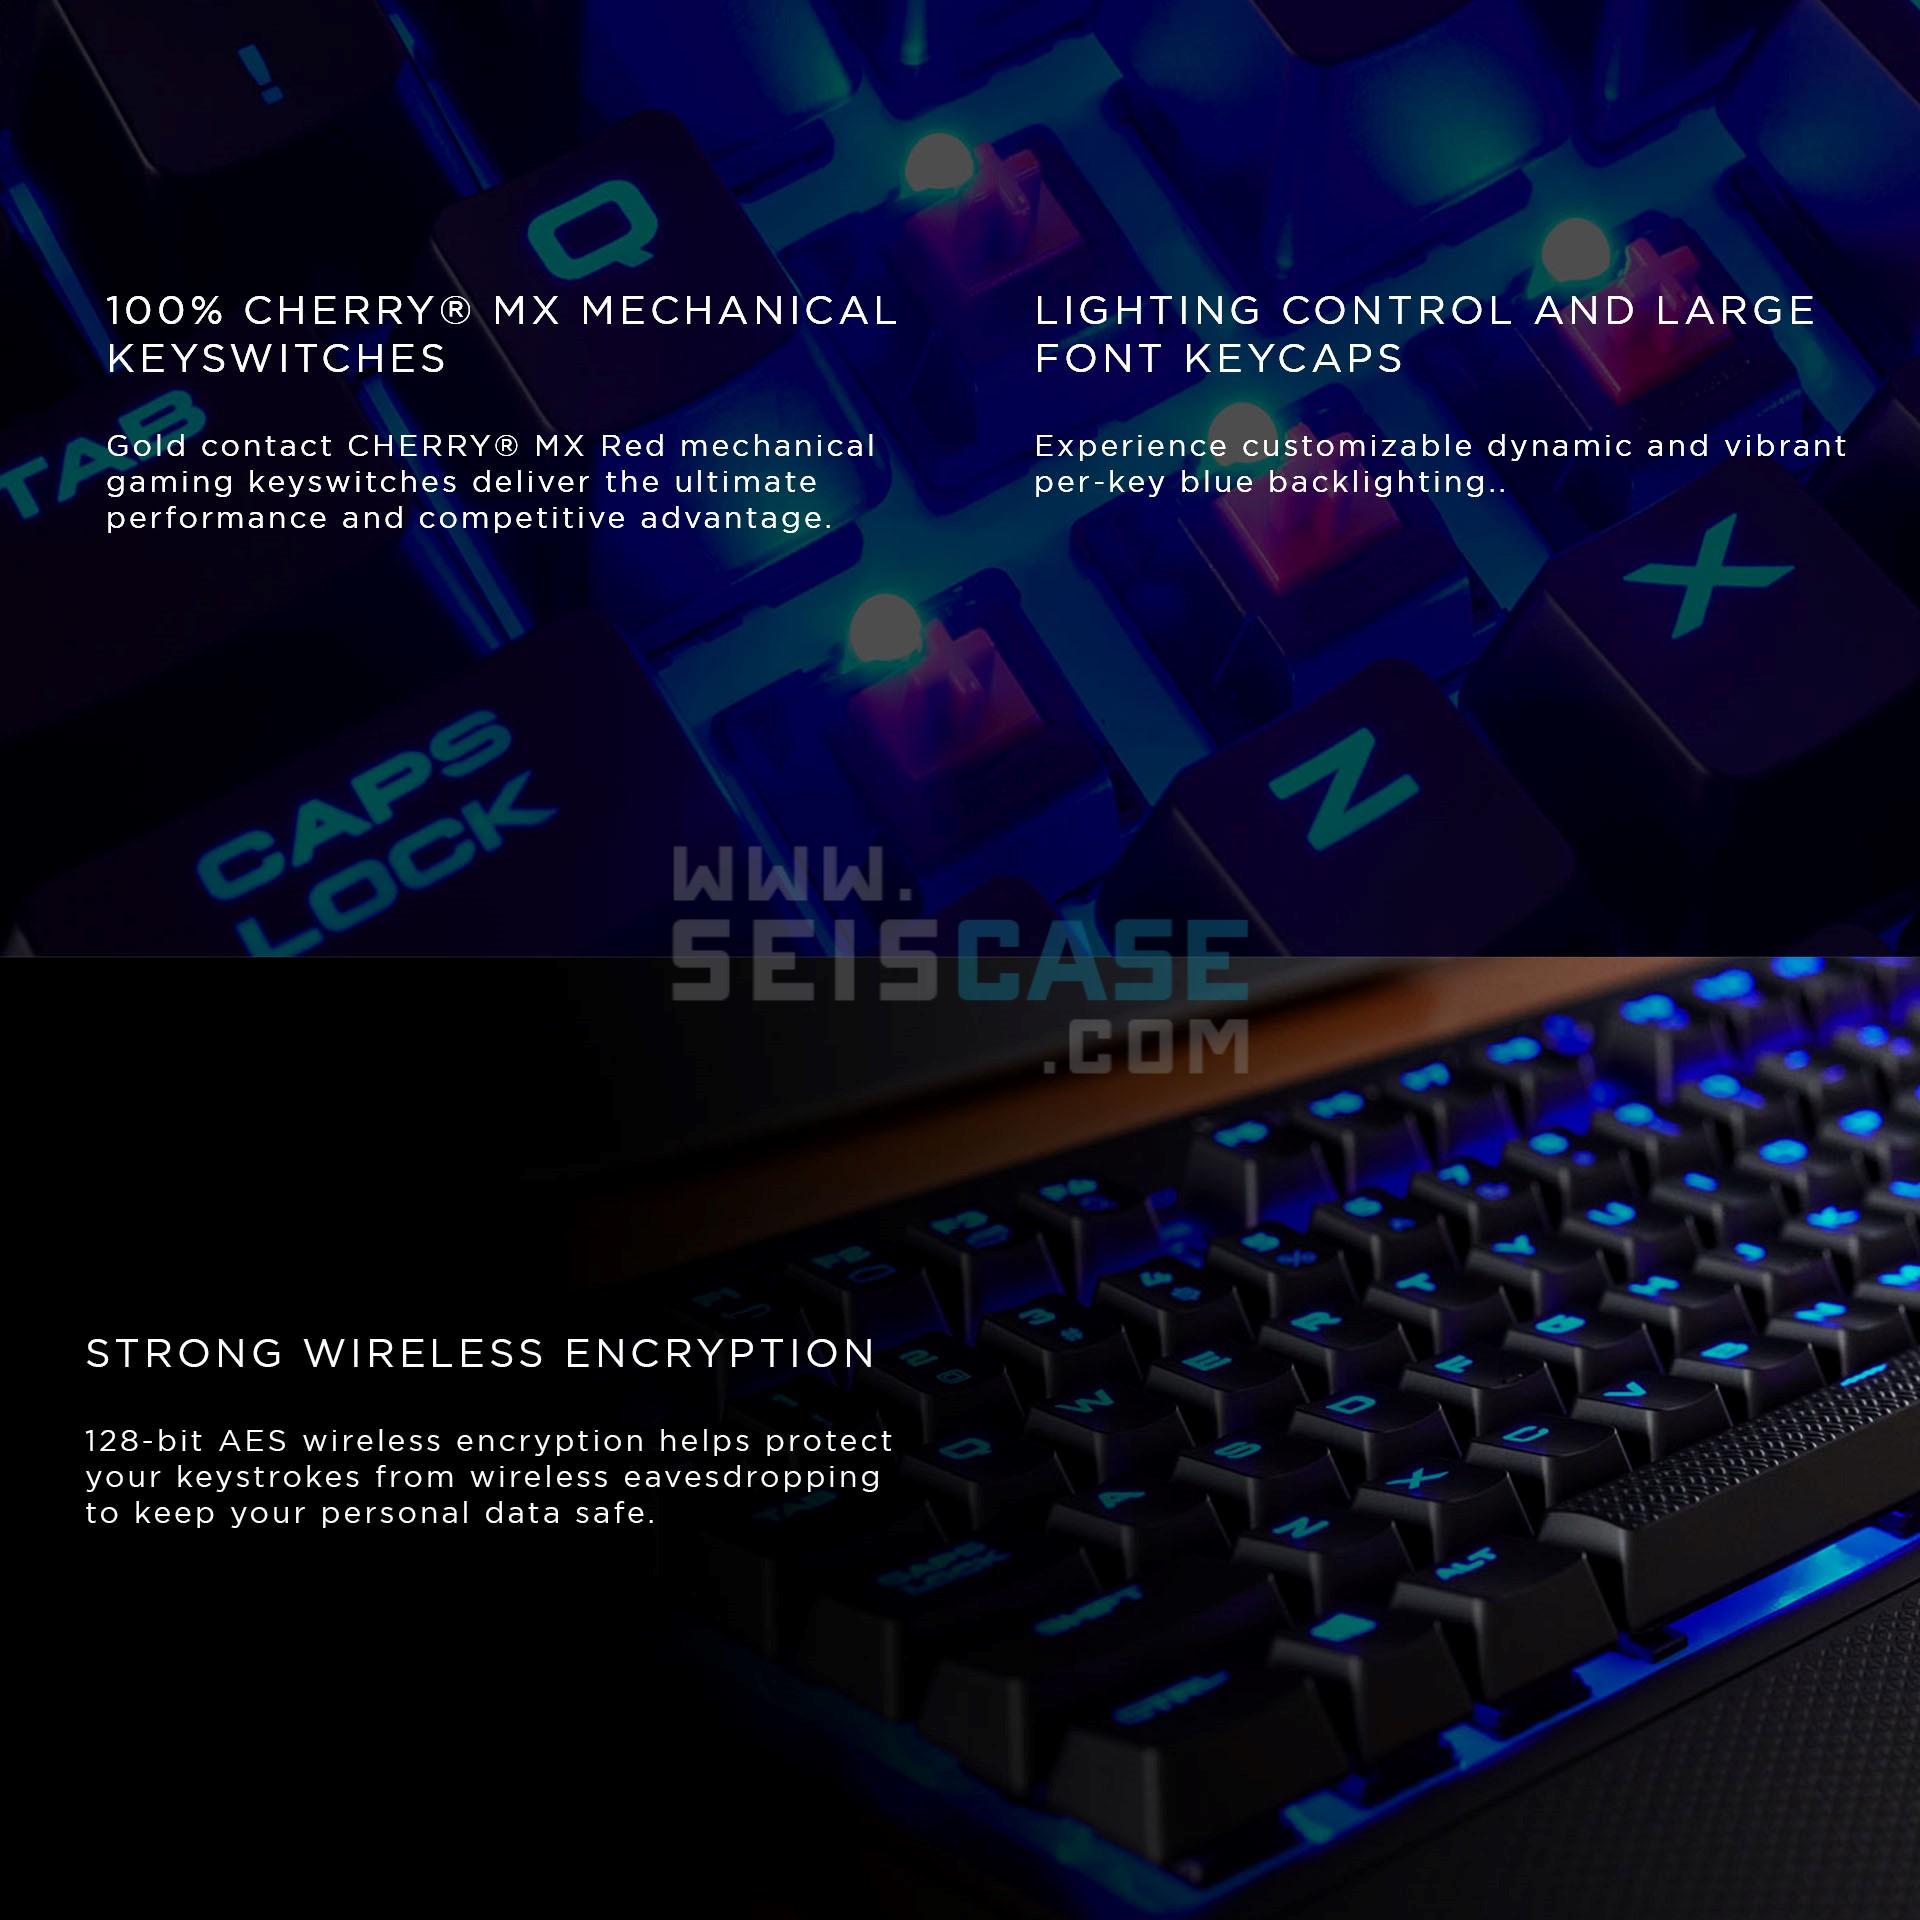 CORSAIR K63 Wireless Compact Mechanical Gaming Keyboard Cherry MX Red